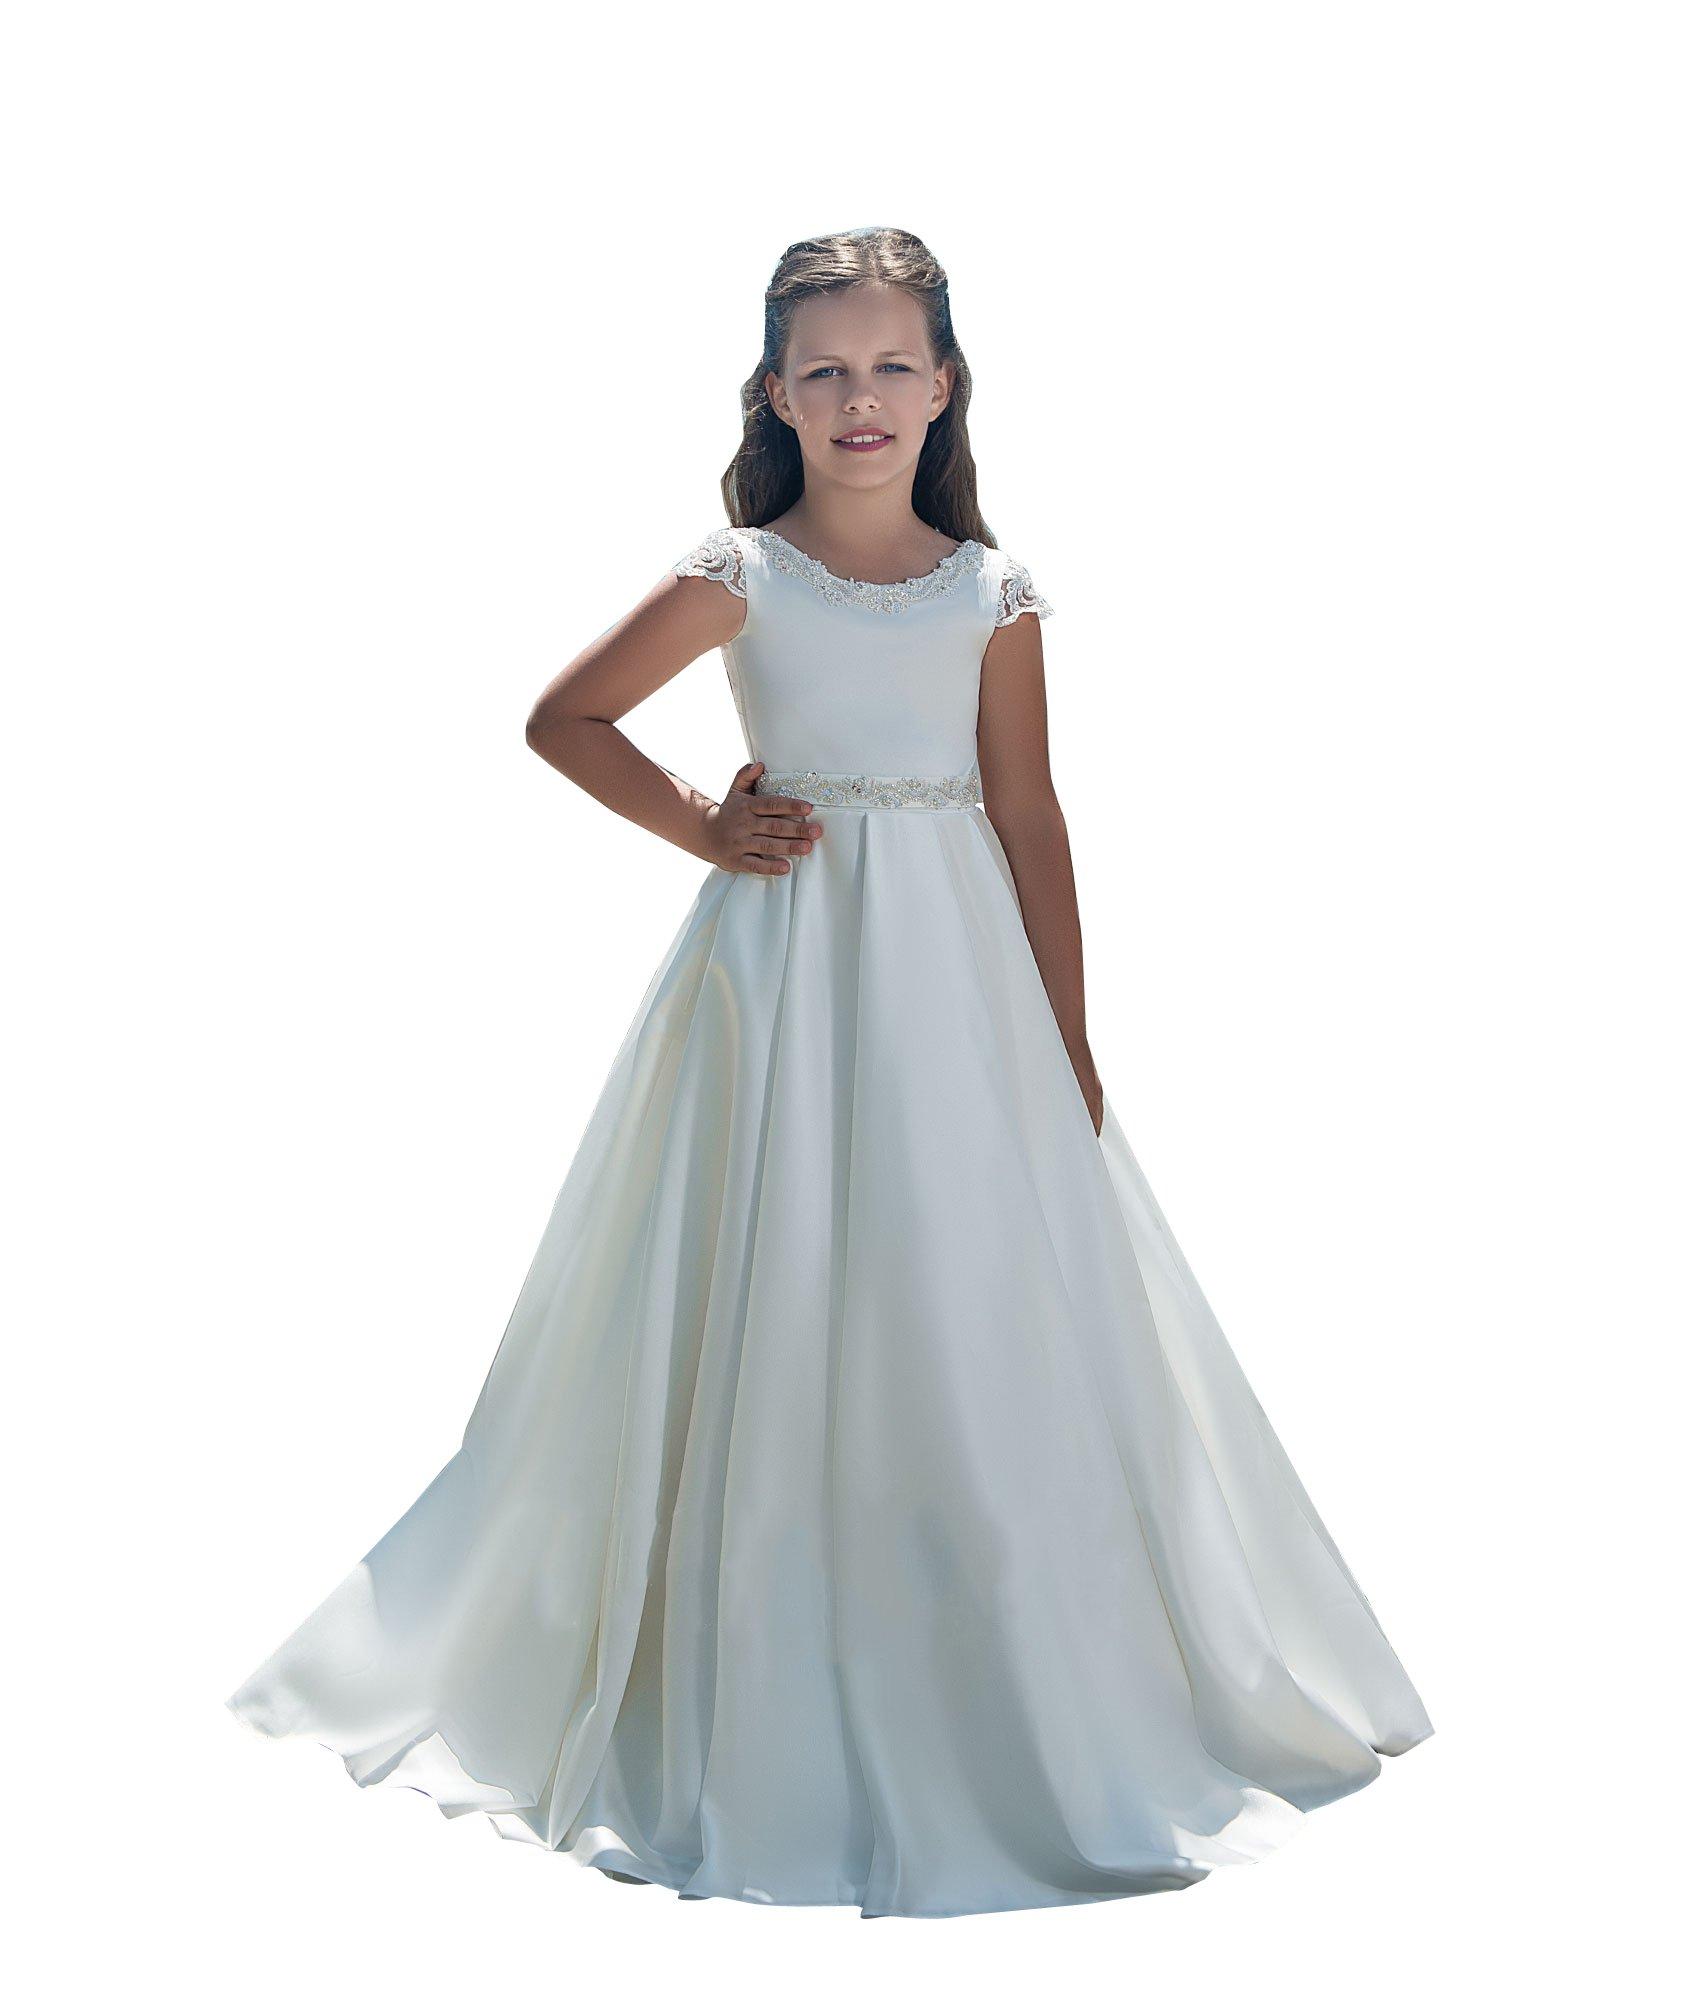 kelaixiang Flower Girl Dress Satin For Wedding Party Formal Dresses Kids Princess White